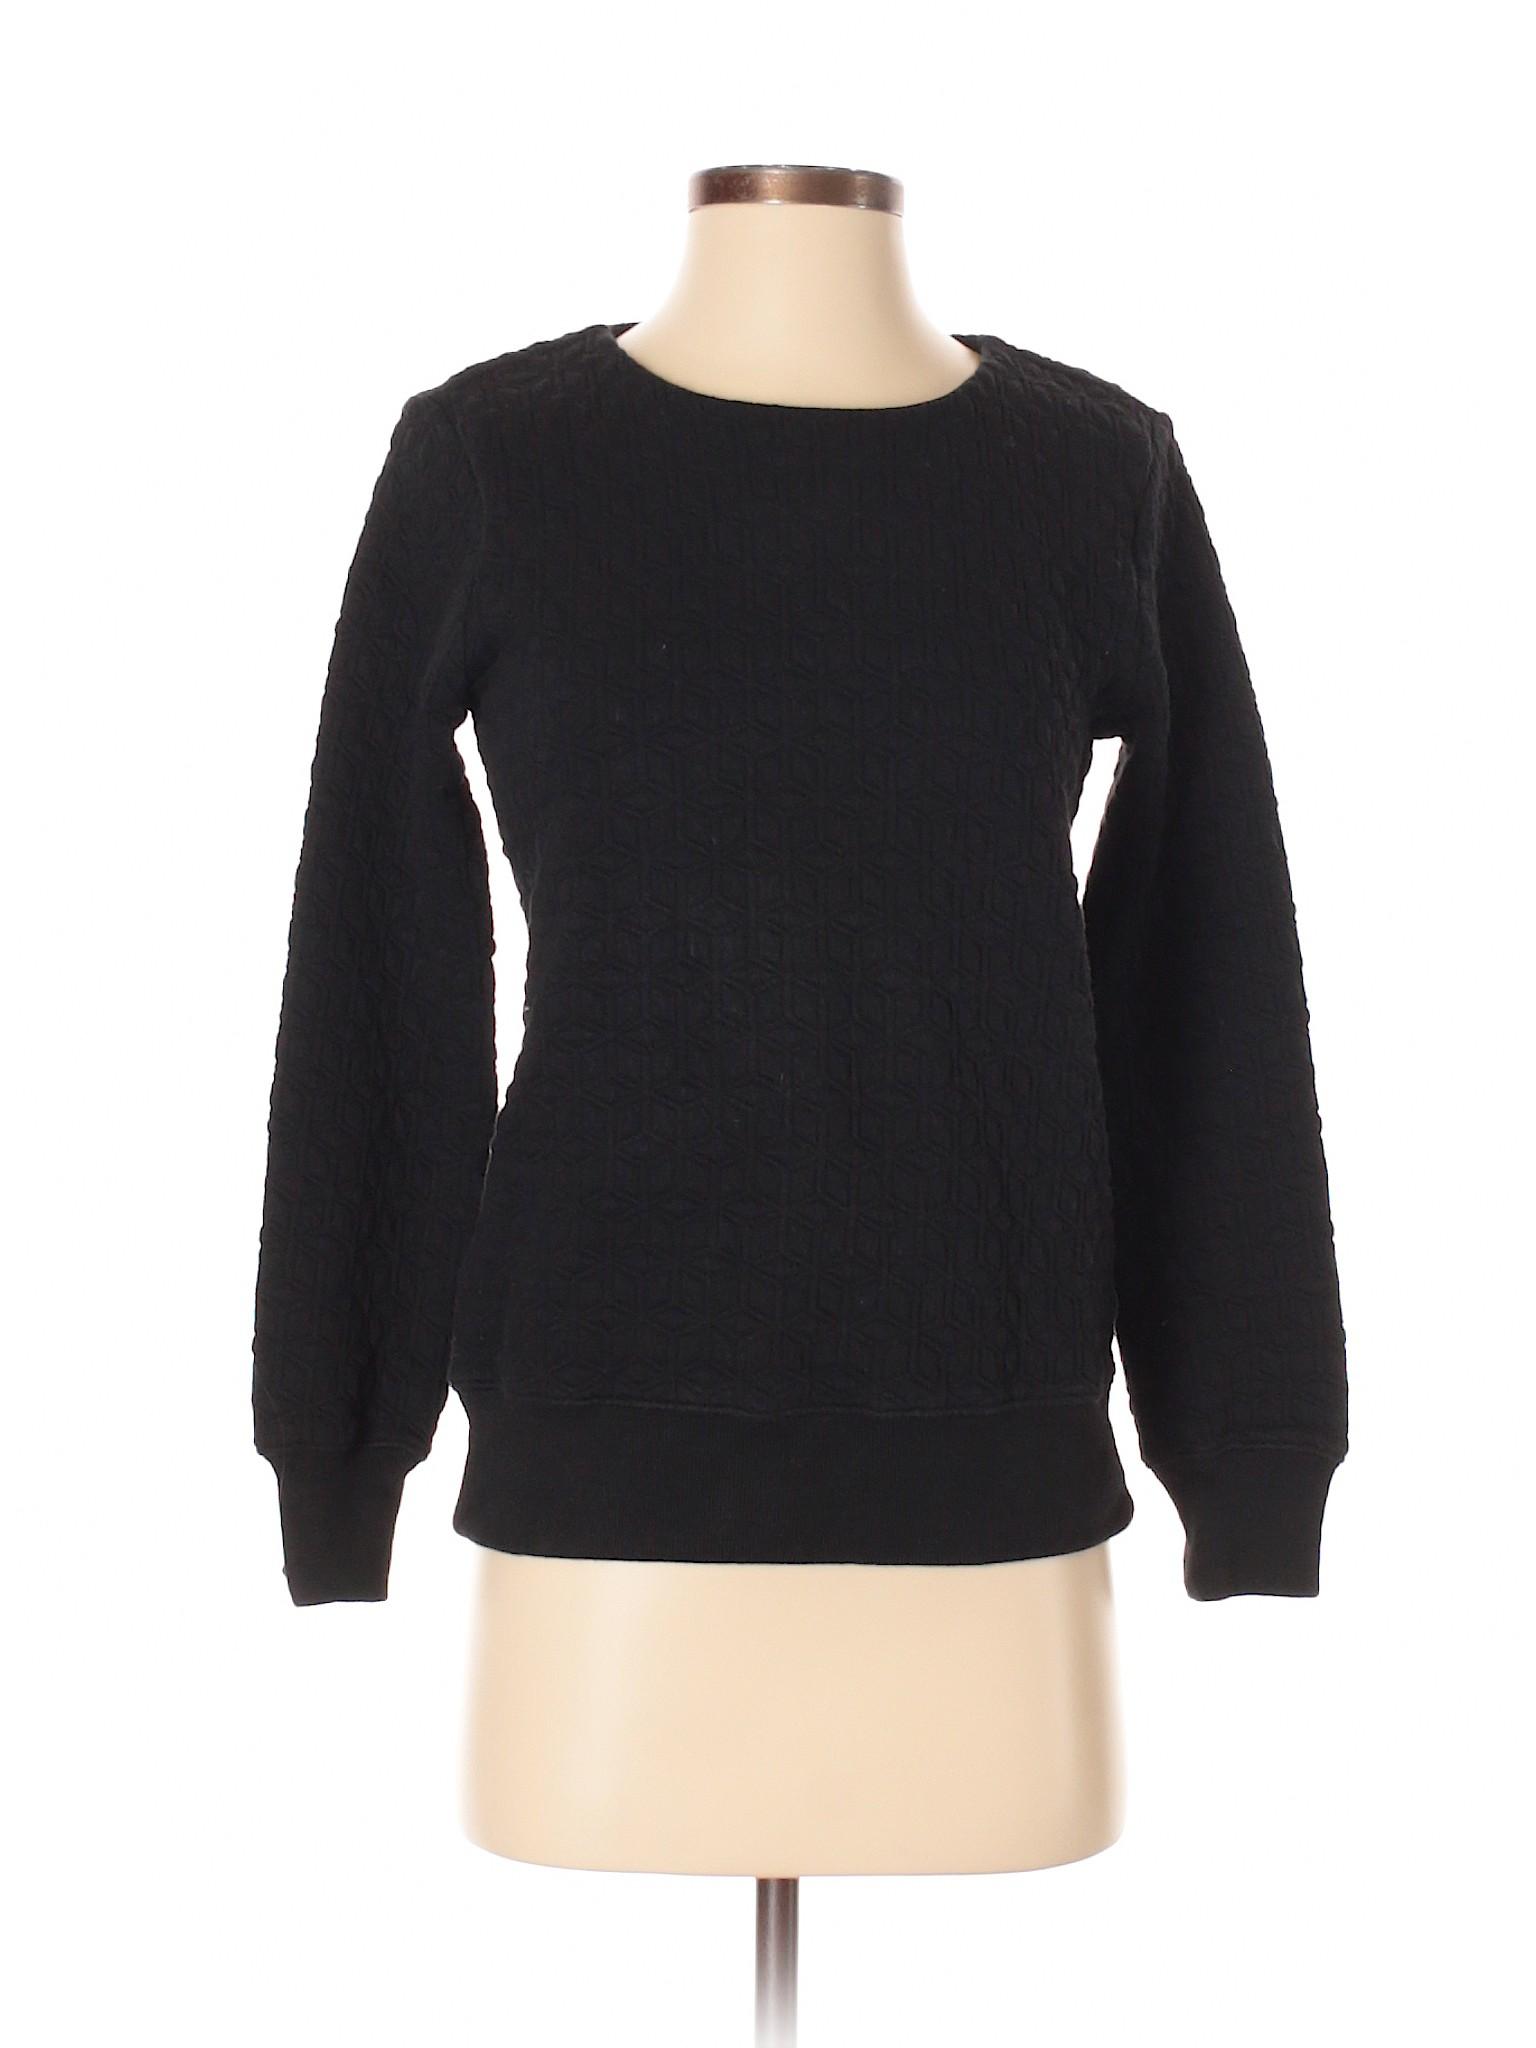 Gap Sweater winter Gap Boutique Pullover winter Pullover Sweater winter Boutique Boutique vdxZvw